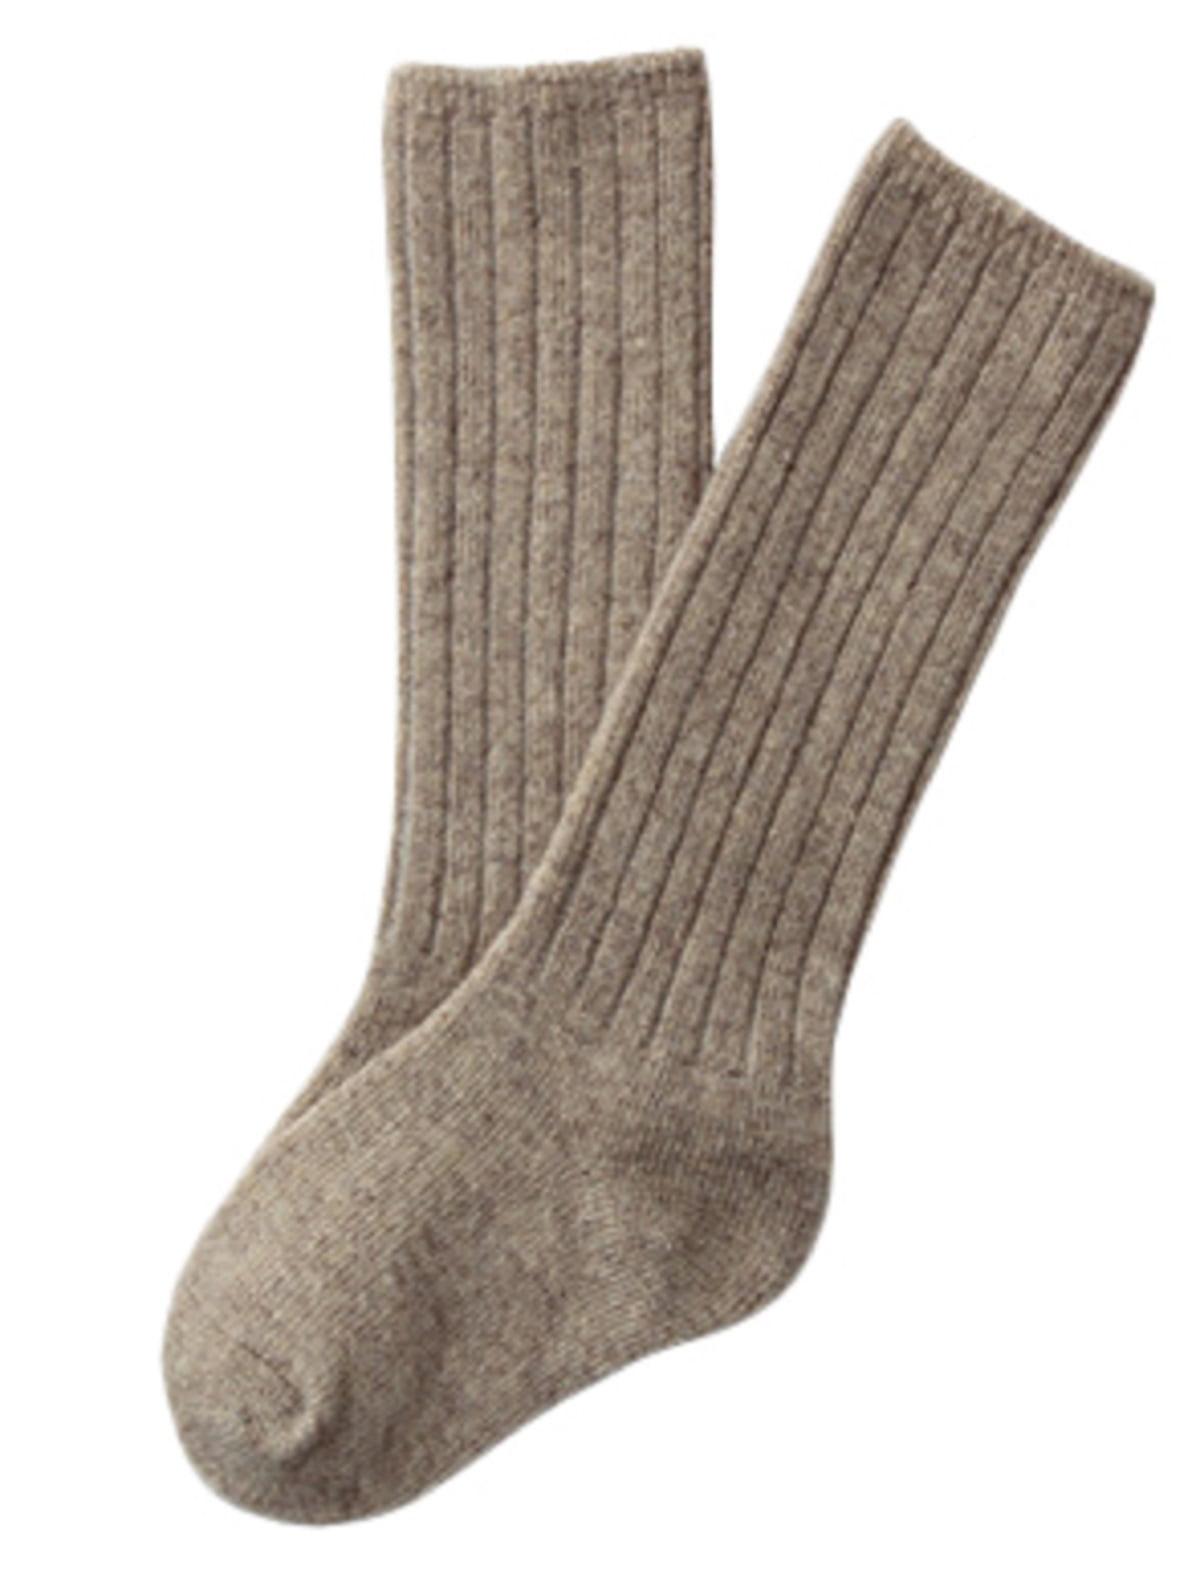 Lian LifeStyle Children 1 Pair Knee High Wool Socks Size 0-2Y  (Black)